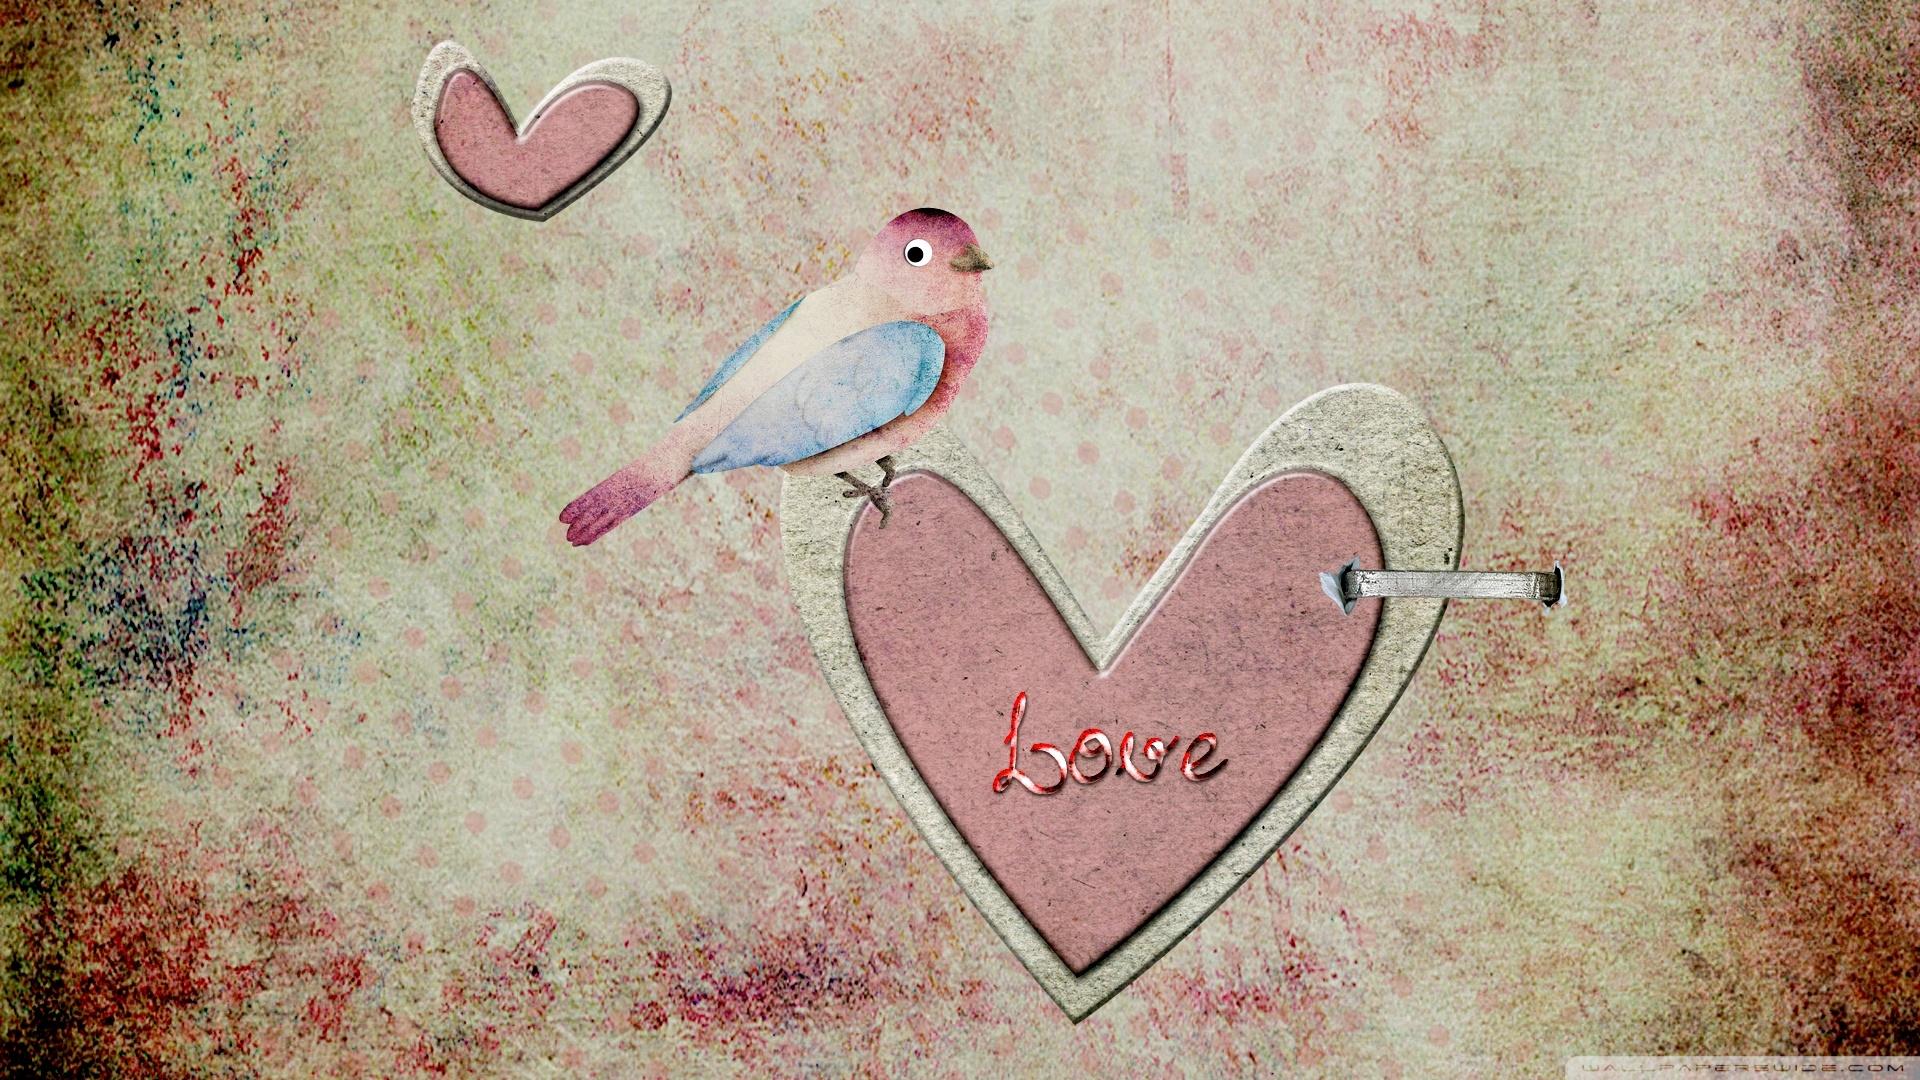 Vintage Art Wallpaper 1920x1080 Vintage Art 1920x1080